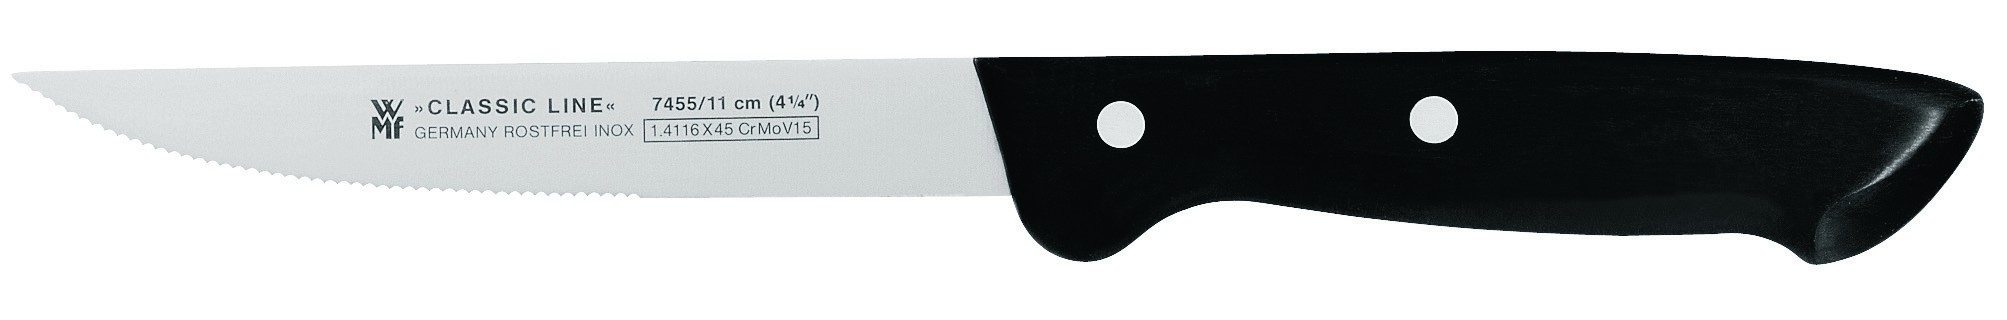 Cuchillo para carne 11 cm Classic Line